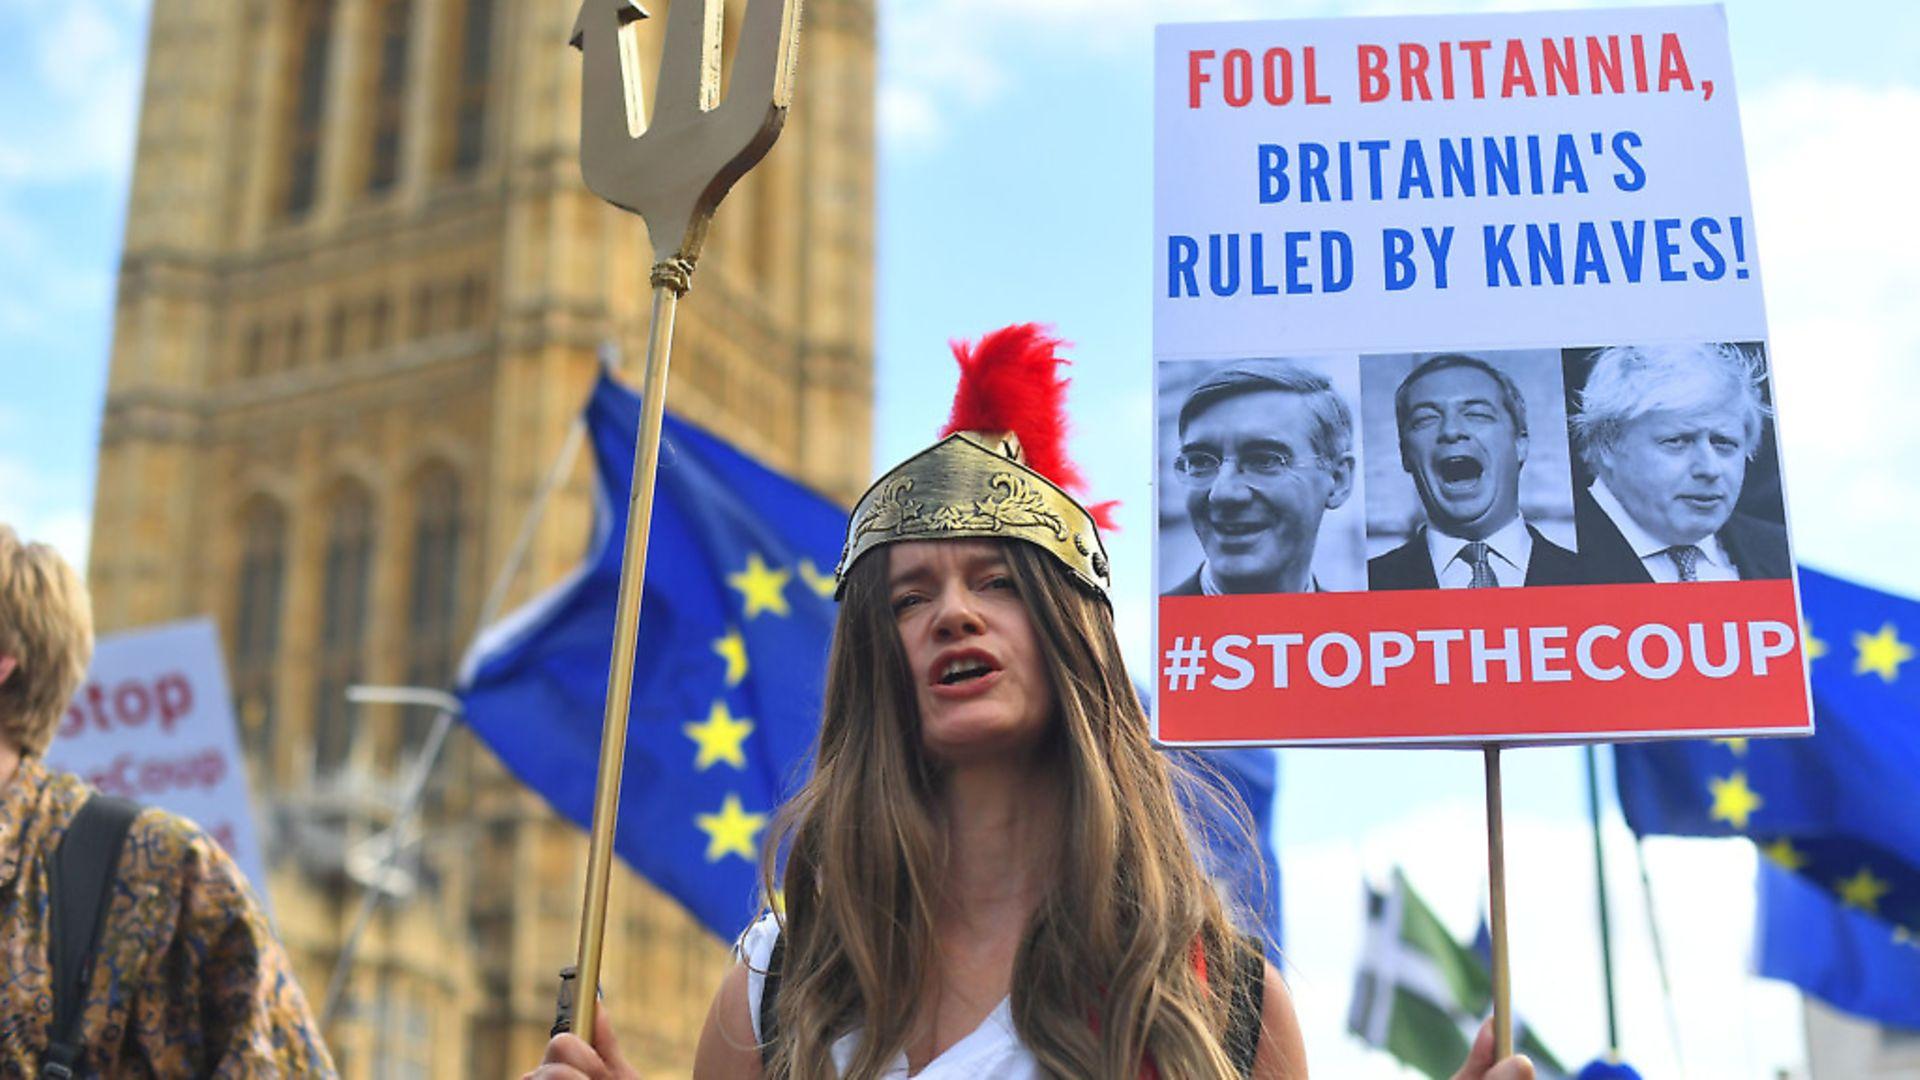 A campaigner protests against Boris Johnson's prorogation of parliament. Photograph: Victoria Jones/PA Wire. - Credit: PA